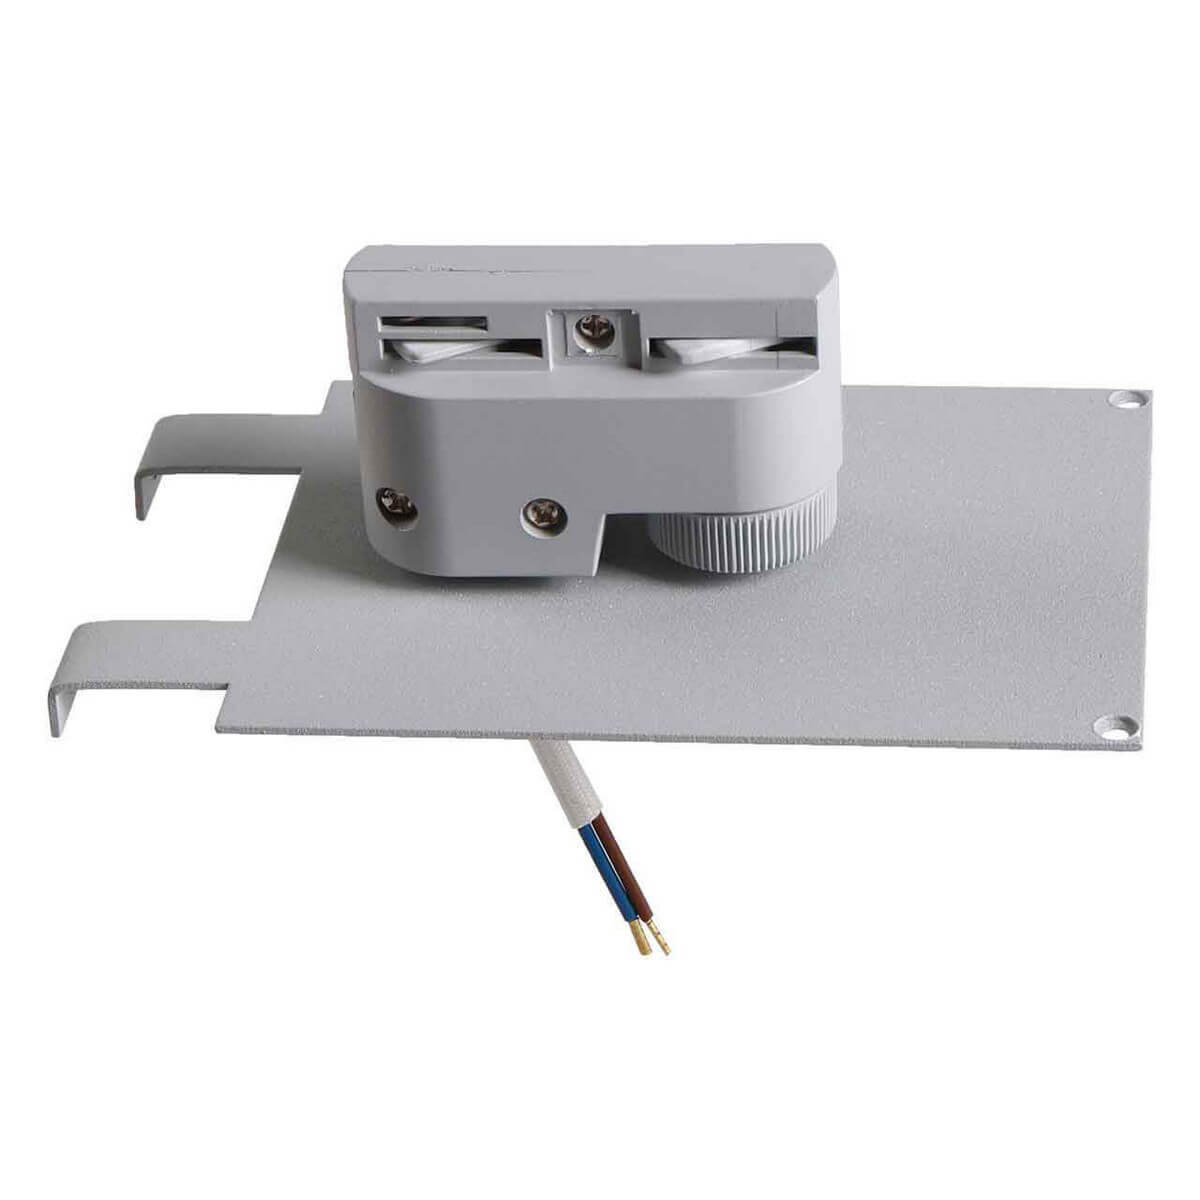 Адаптер для шинопровода Lightstar 592039 Asta Gray (для однофазного шинопровода)